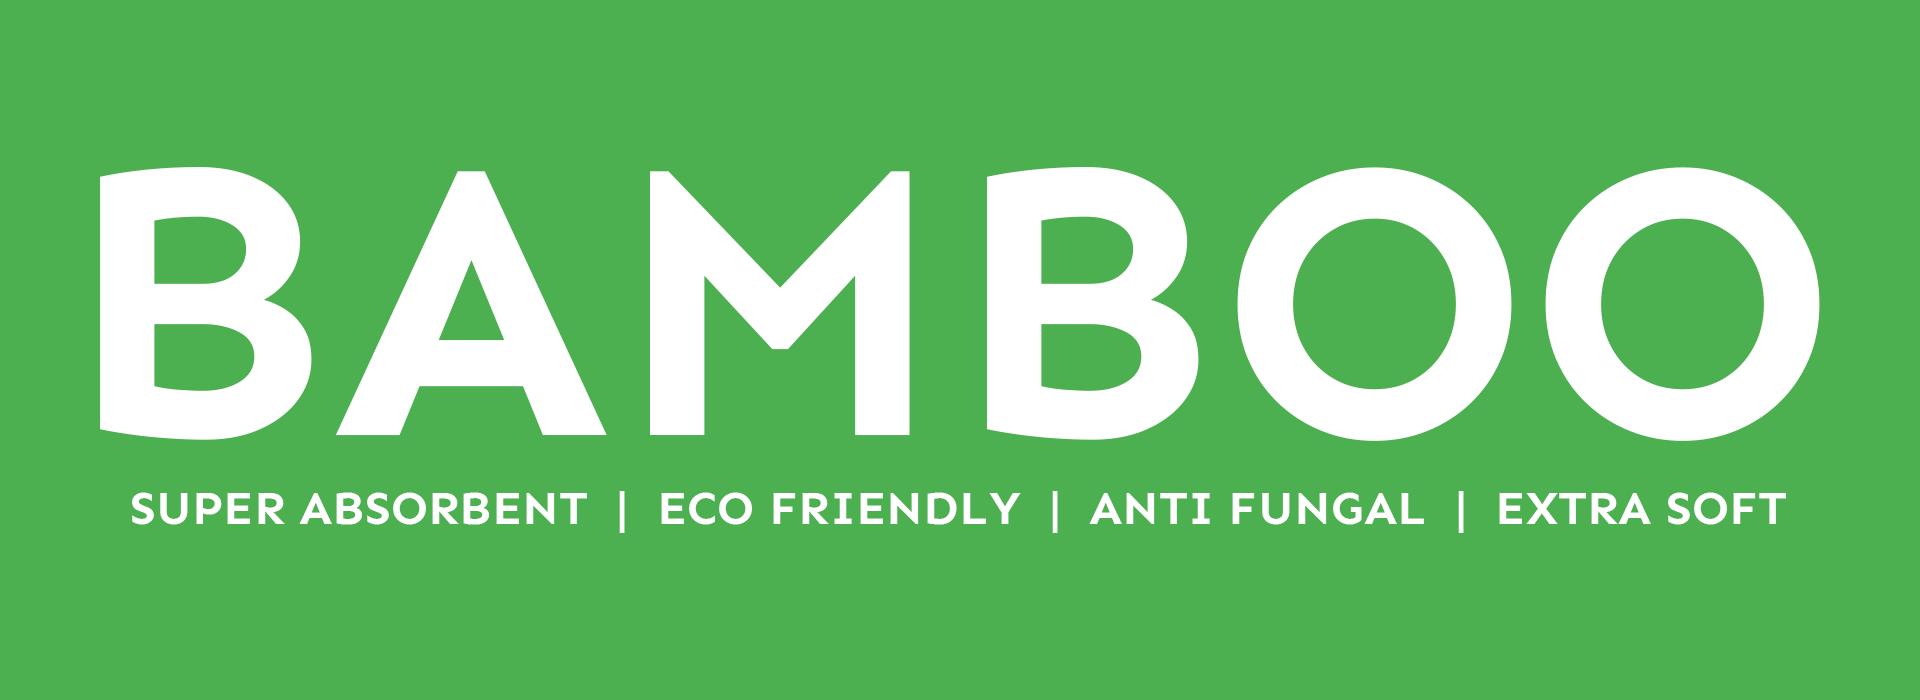 bamboo-tts-2020.png